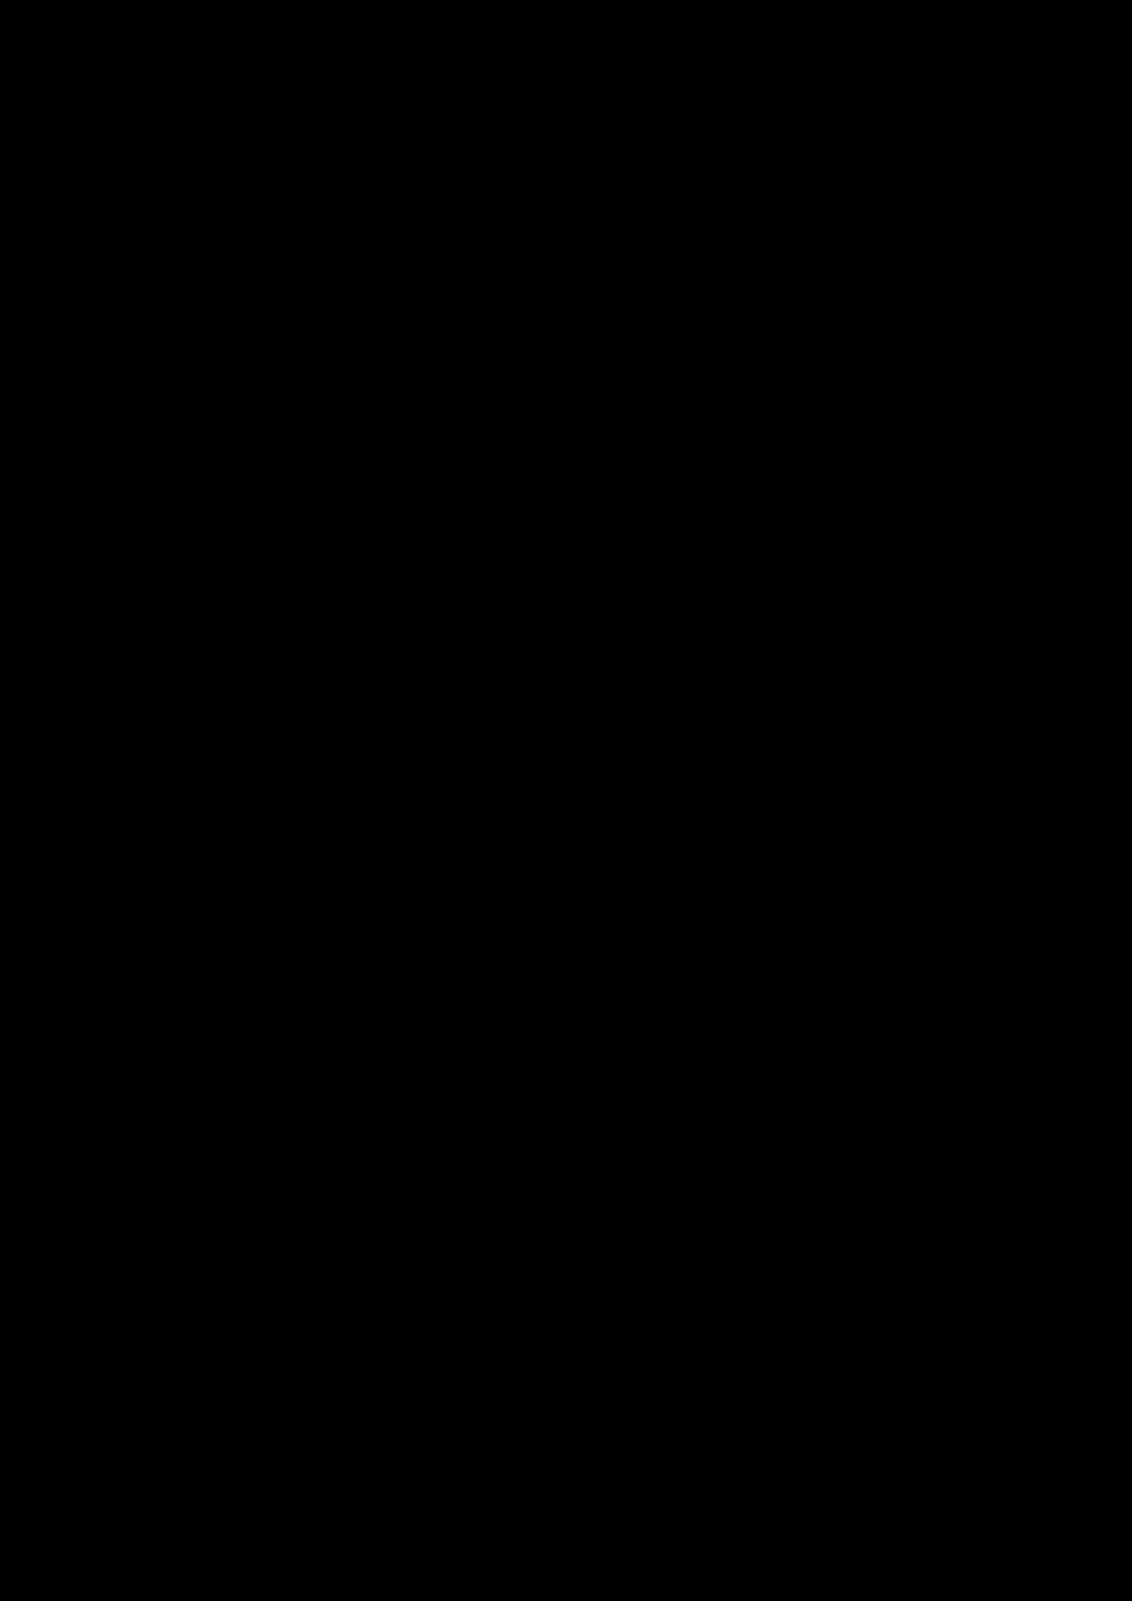 Belyiy sokol slide, Image 64